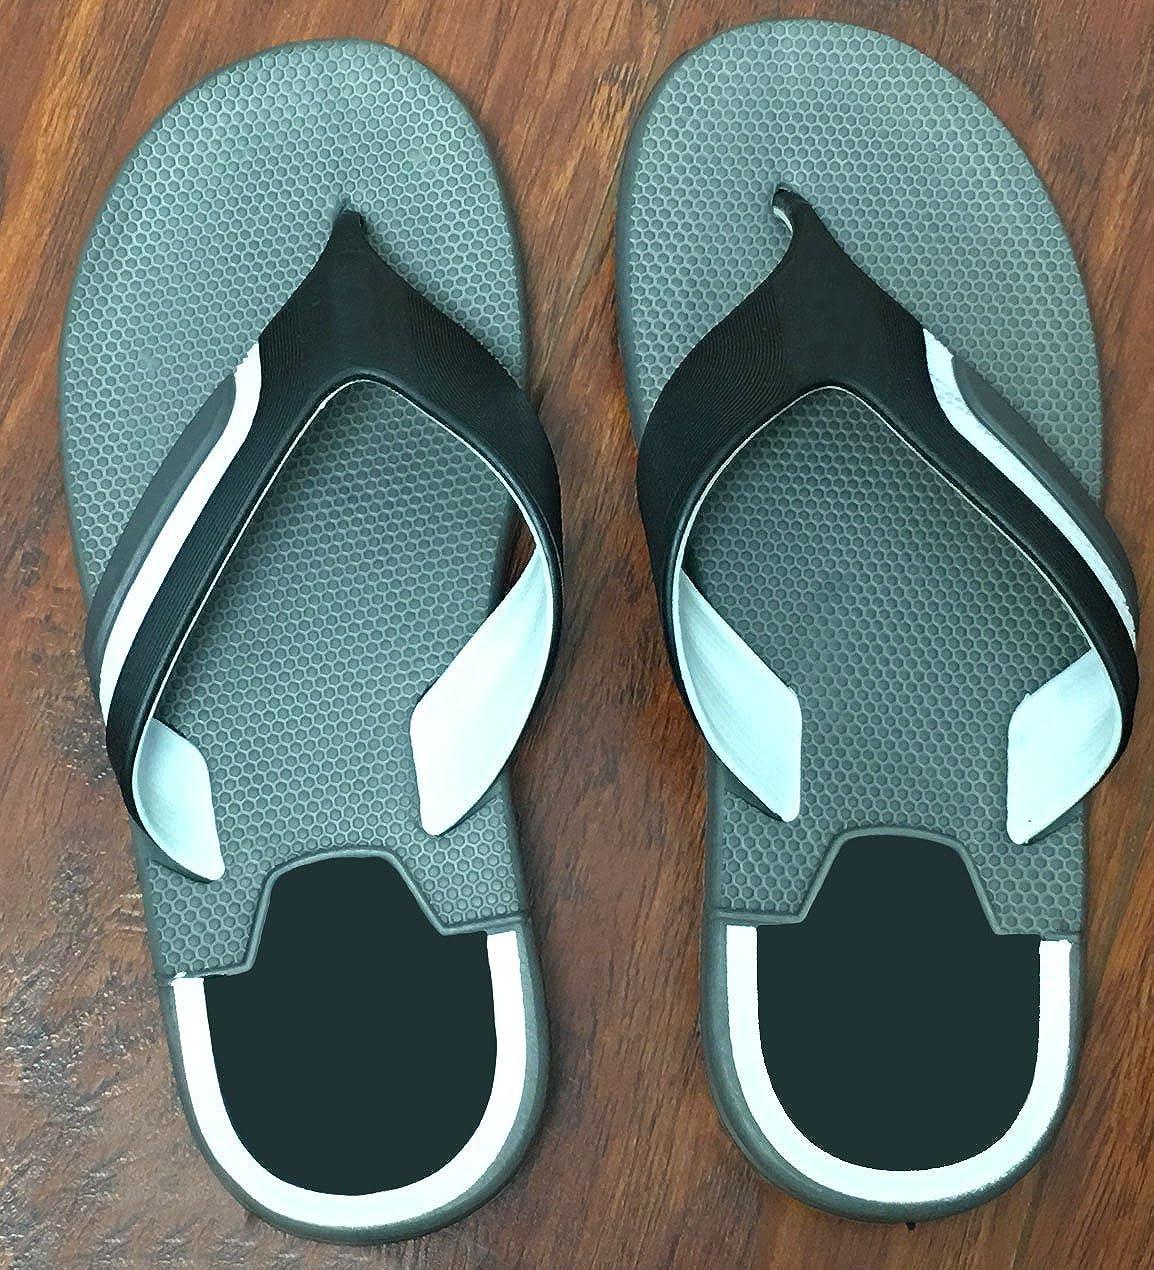 Men's & Women's Slides Comfortable Beach Sandals Slipper Non Slip Yoga Mat Flip-Flops Shower Beach Shoe